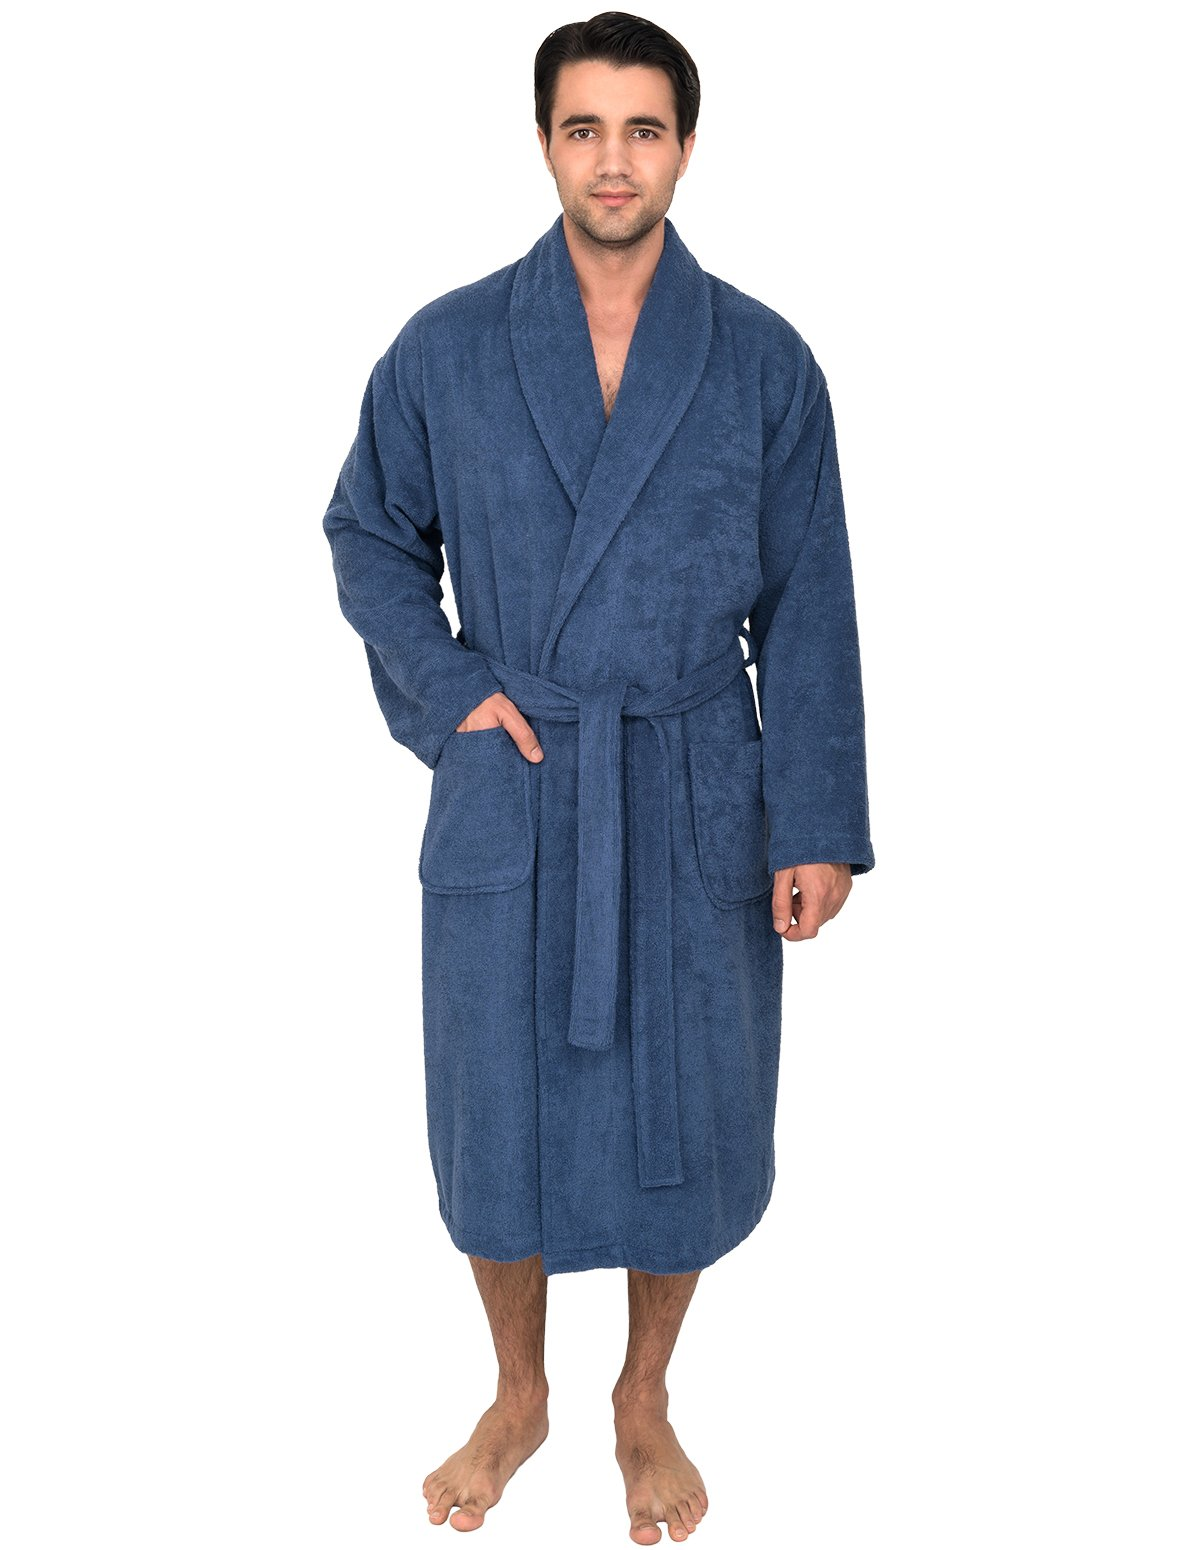 TowelSelections Men's Robe, Turkish Cotton Terry Shawl Bathrobe Large/X-Large Bijou Blue